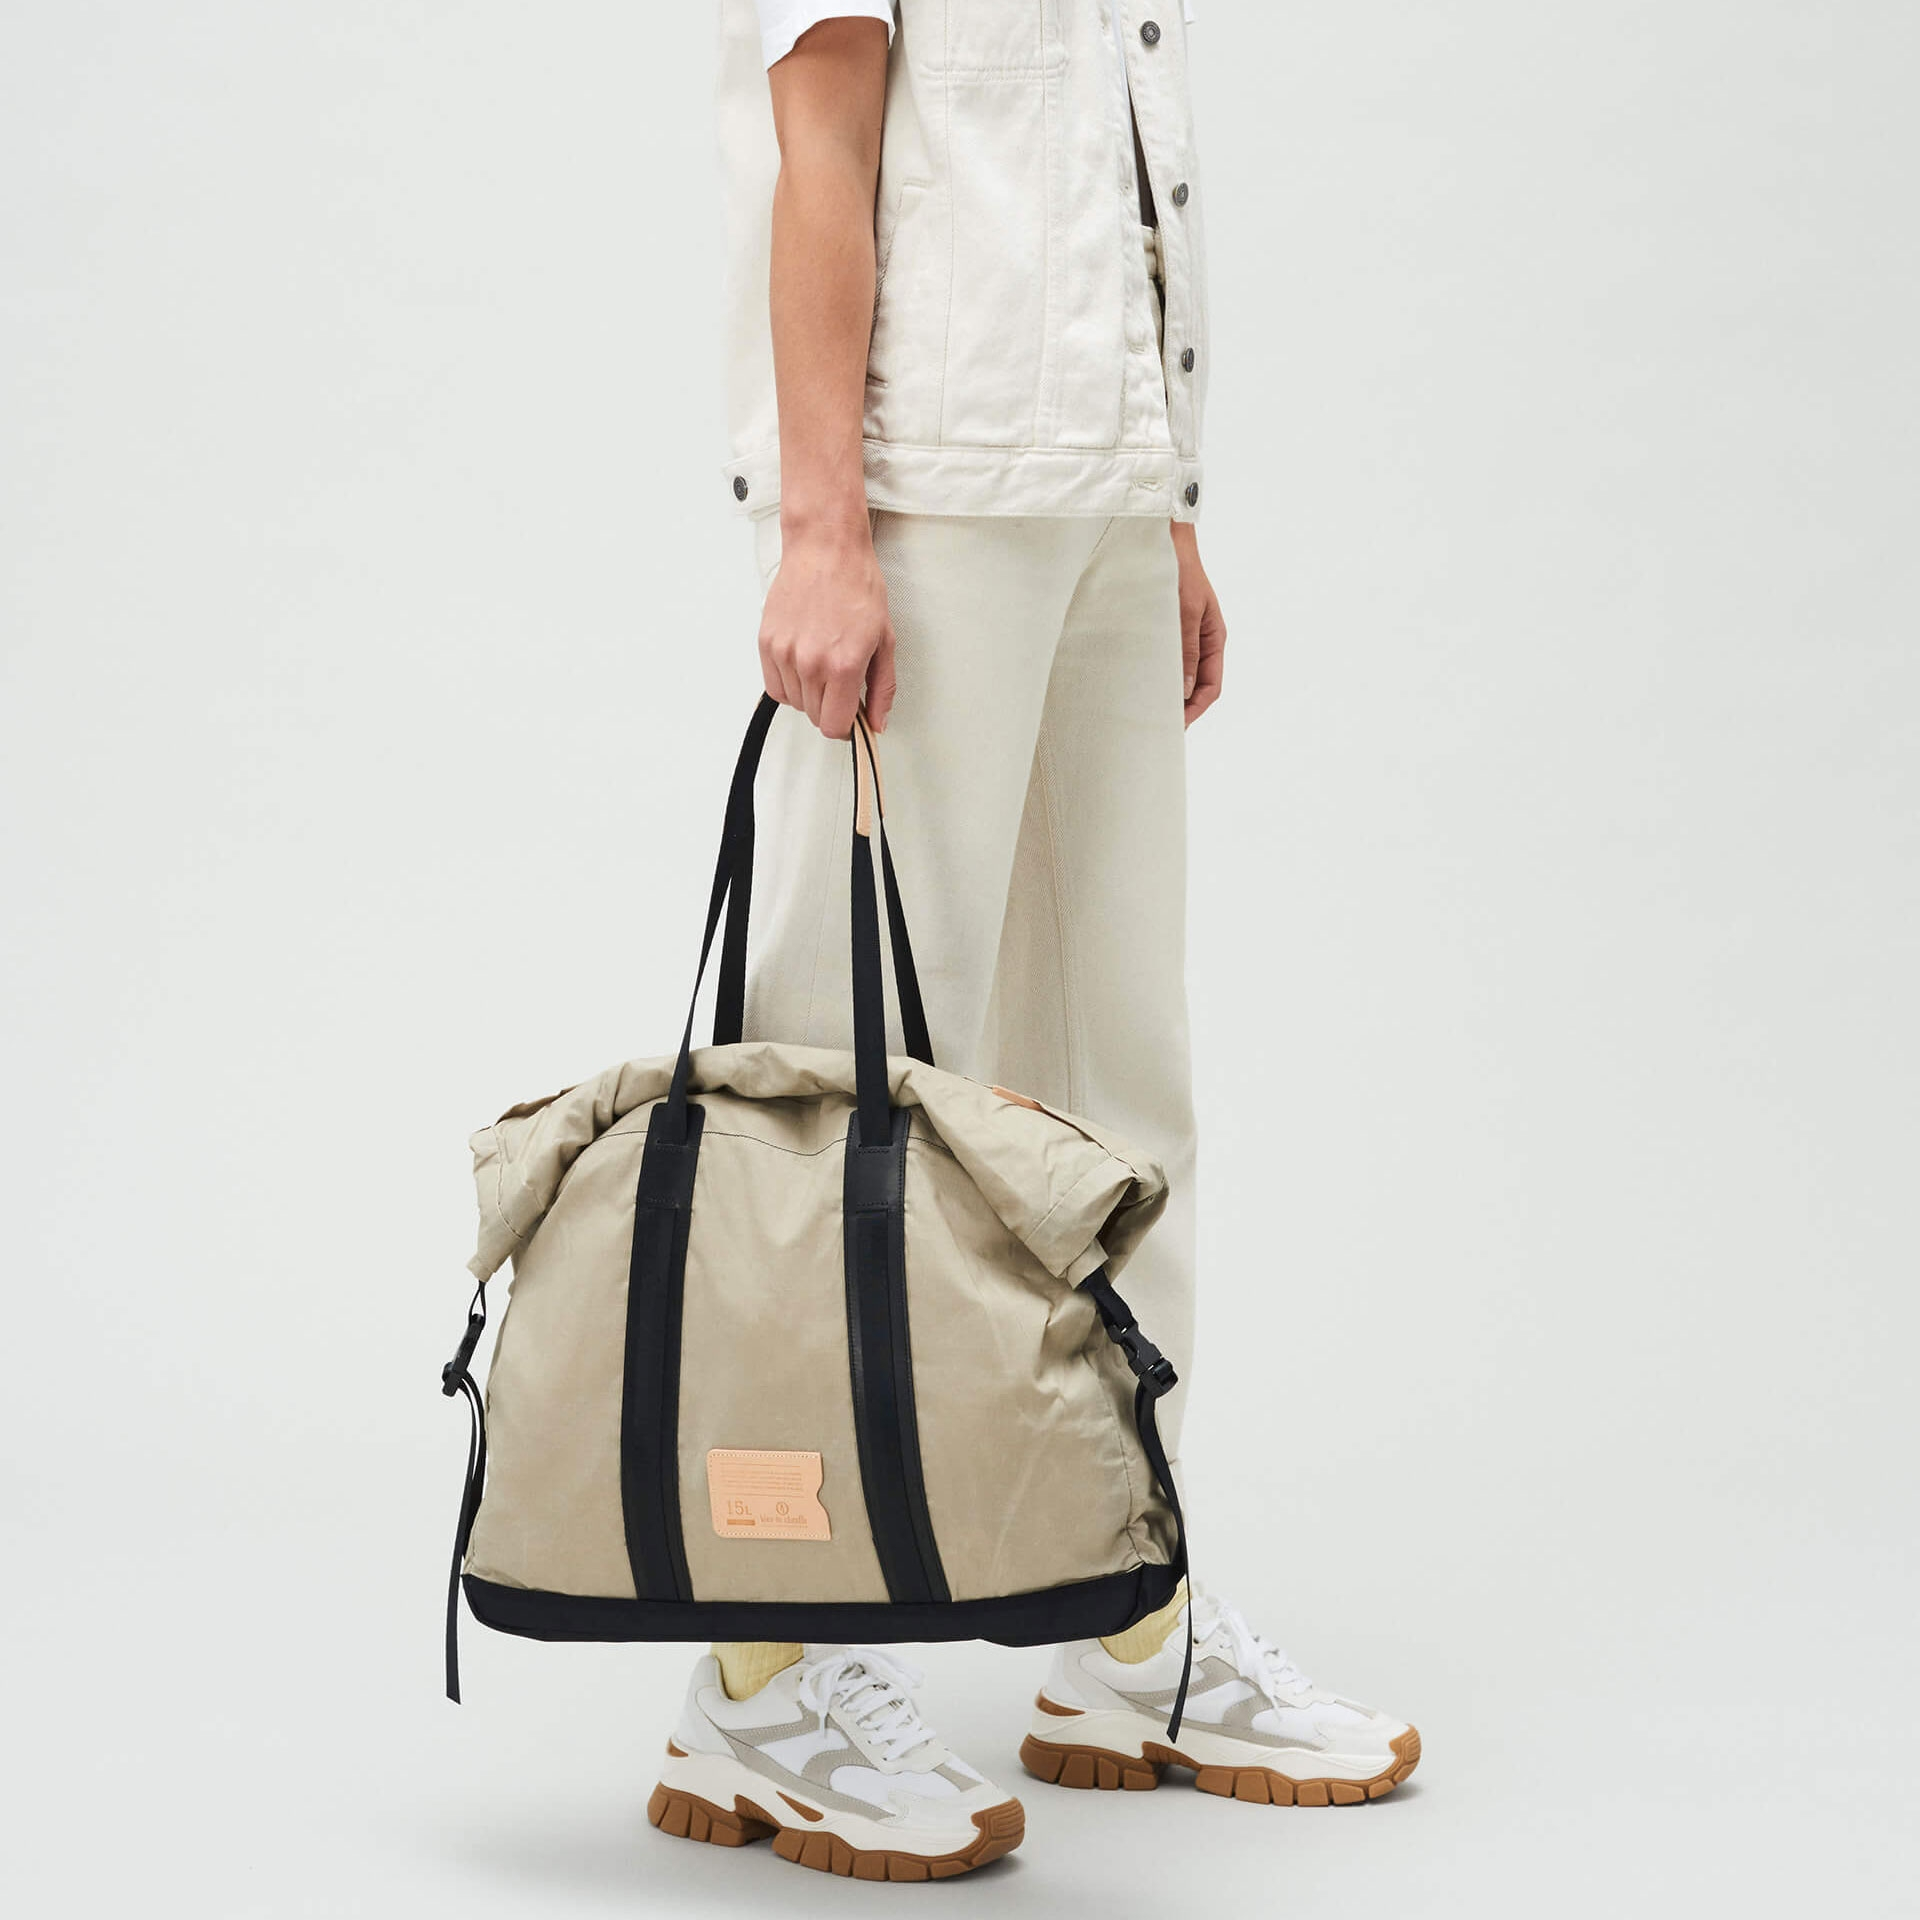 15L Barda Tote bag - Beige (image n°5)